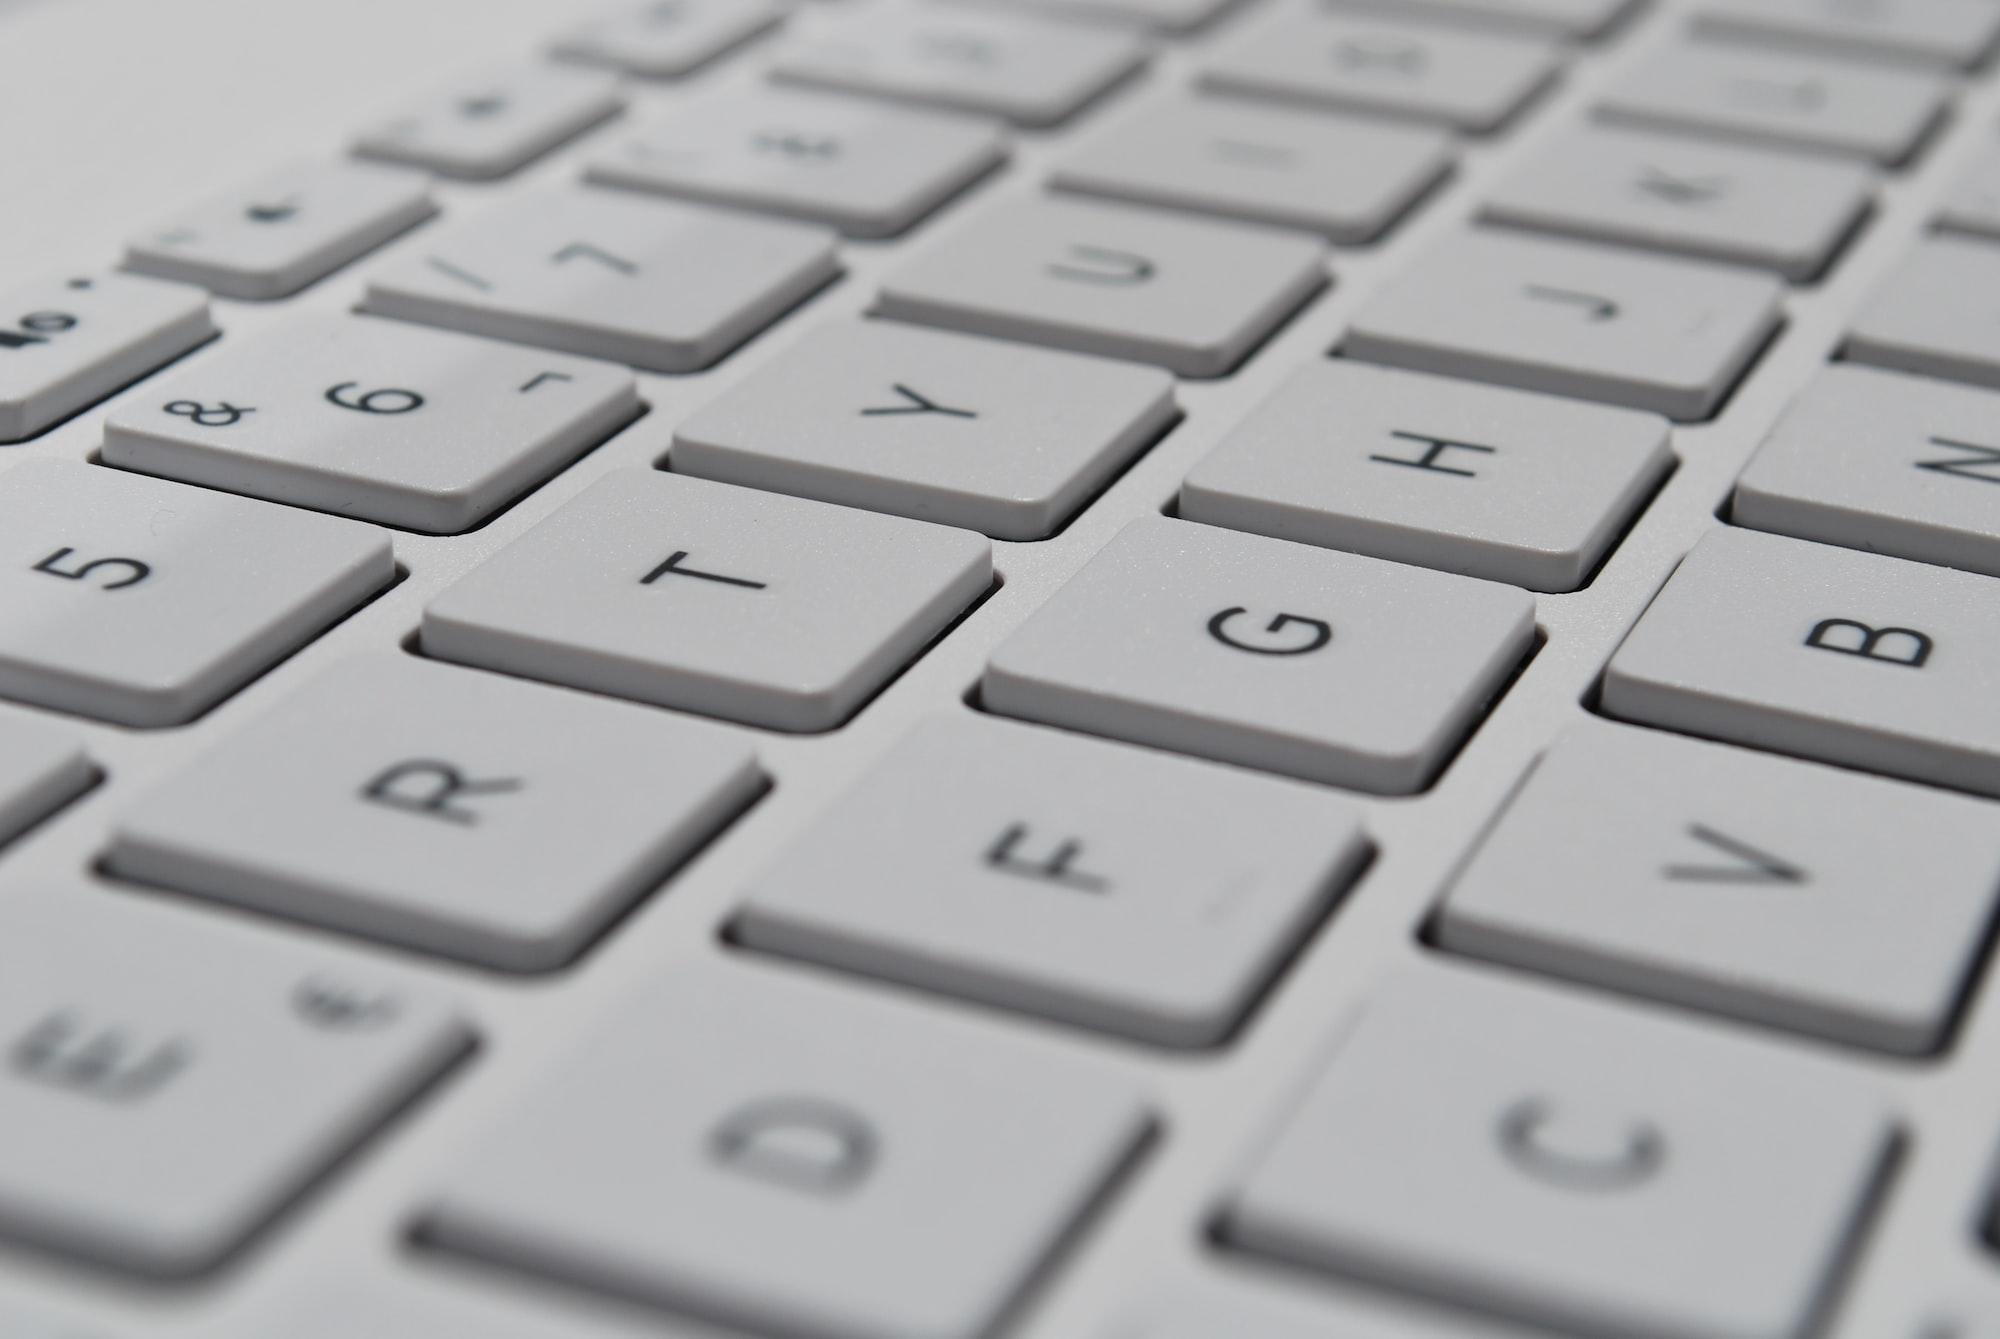 Colemak 鍵盤配置,讓你打字變舒適!